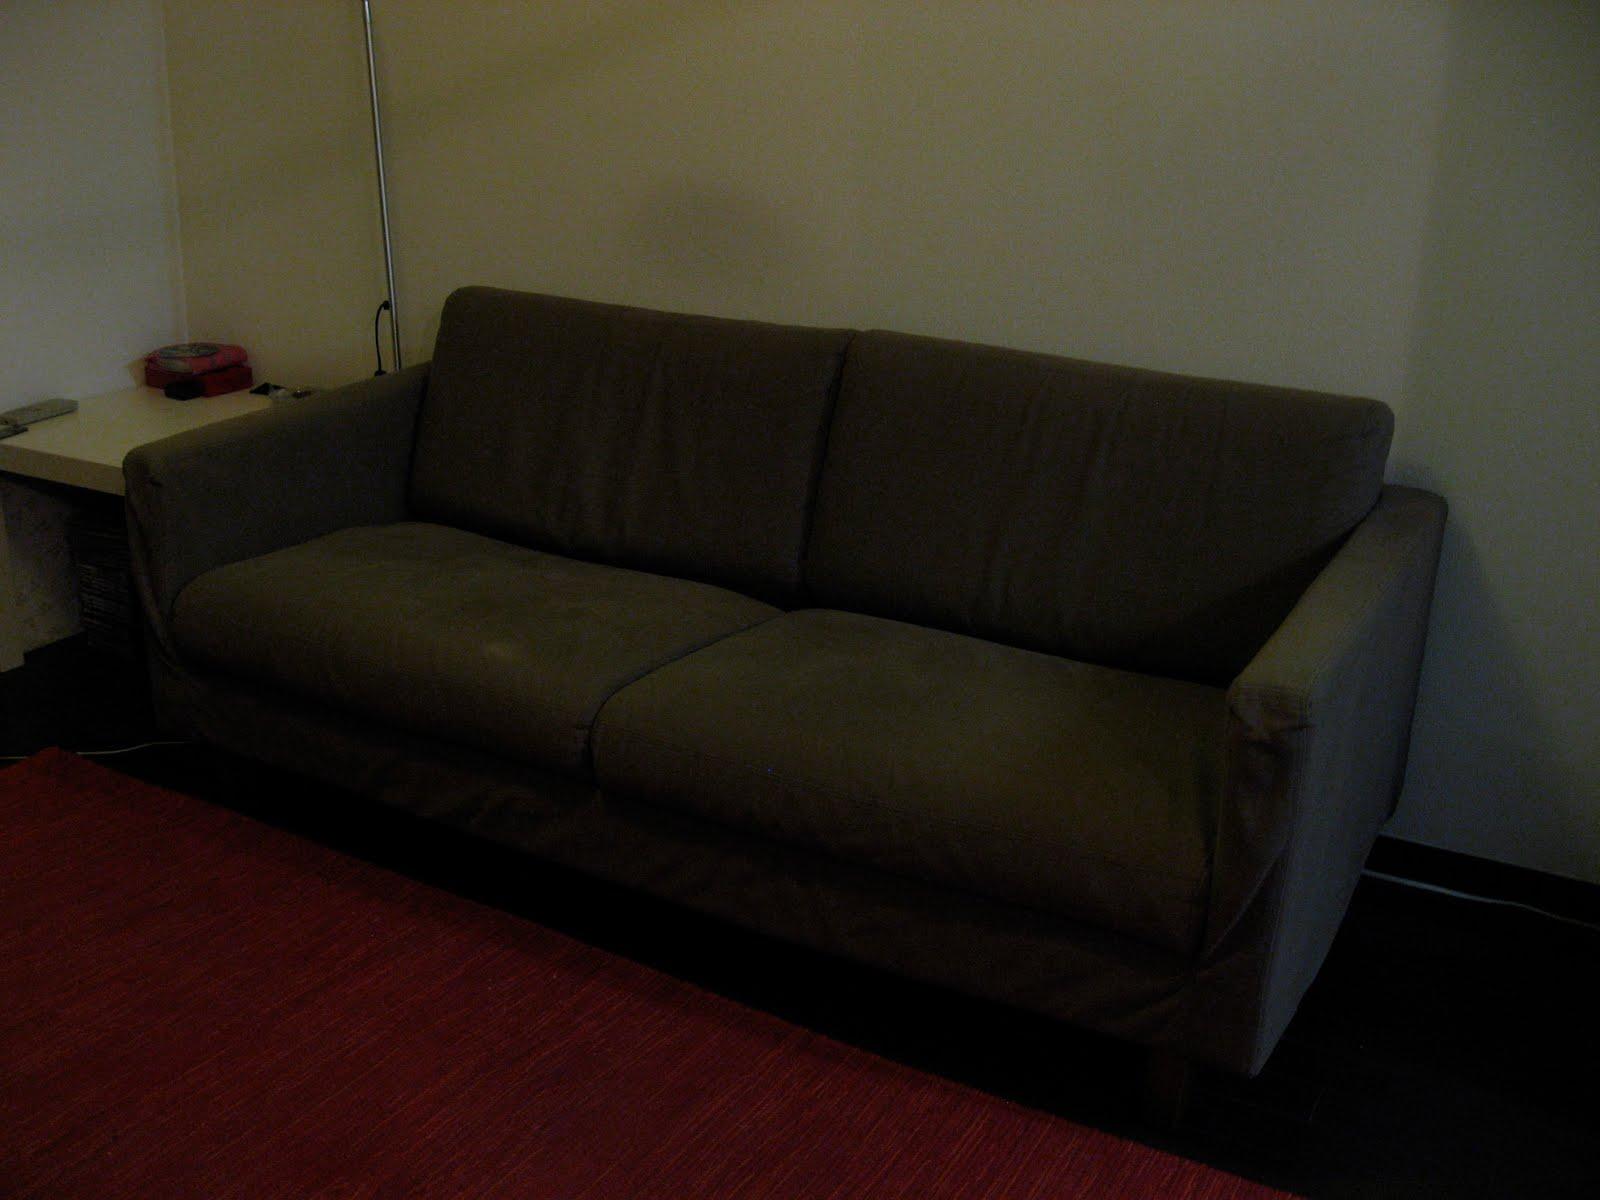 Harajuku Sayonara Muji Sofa